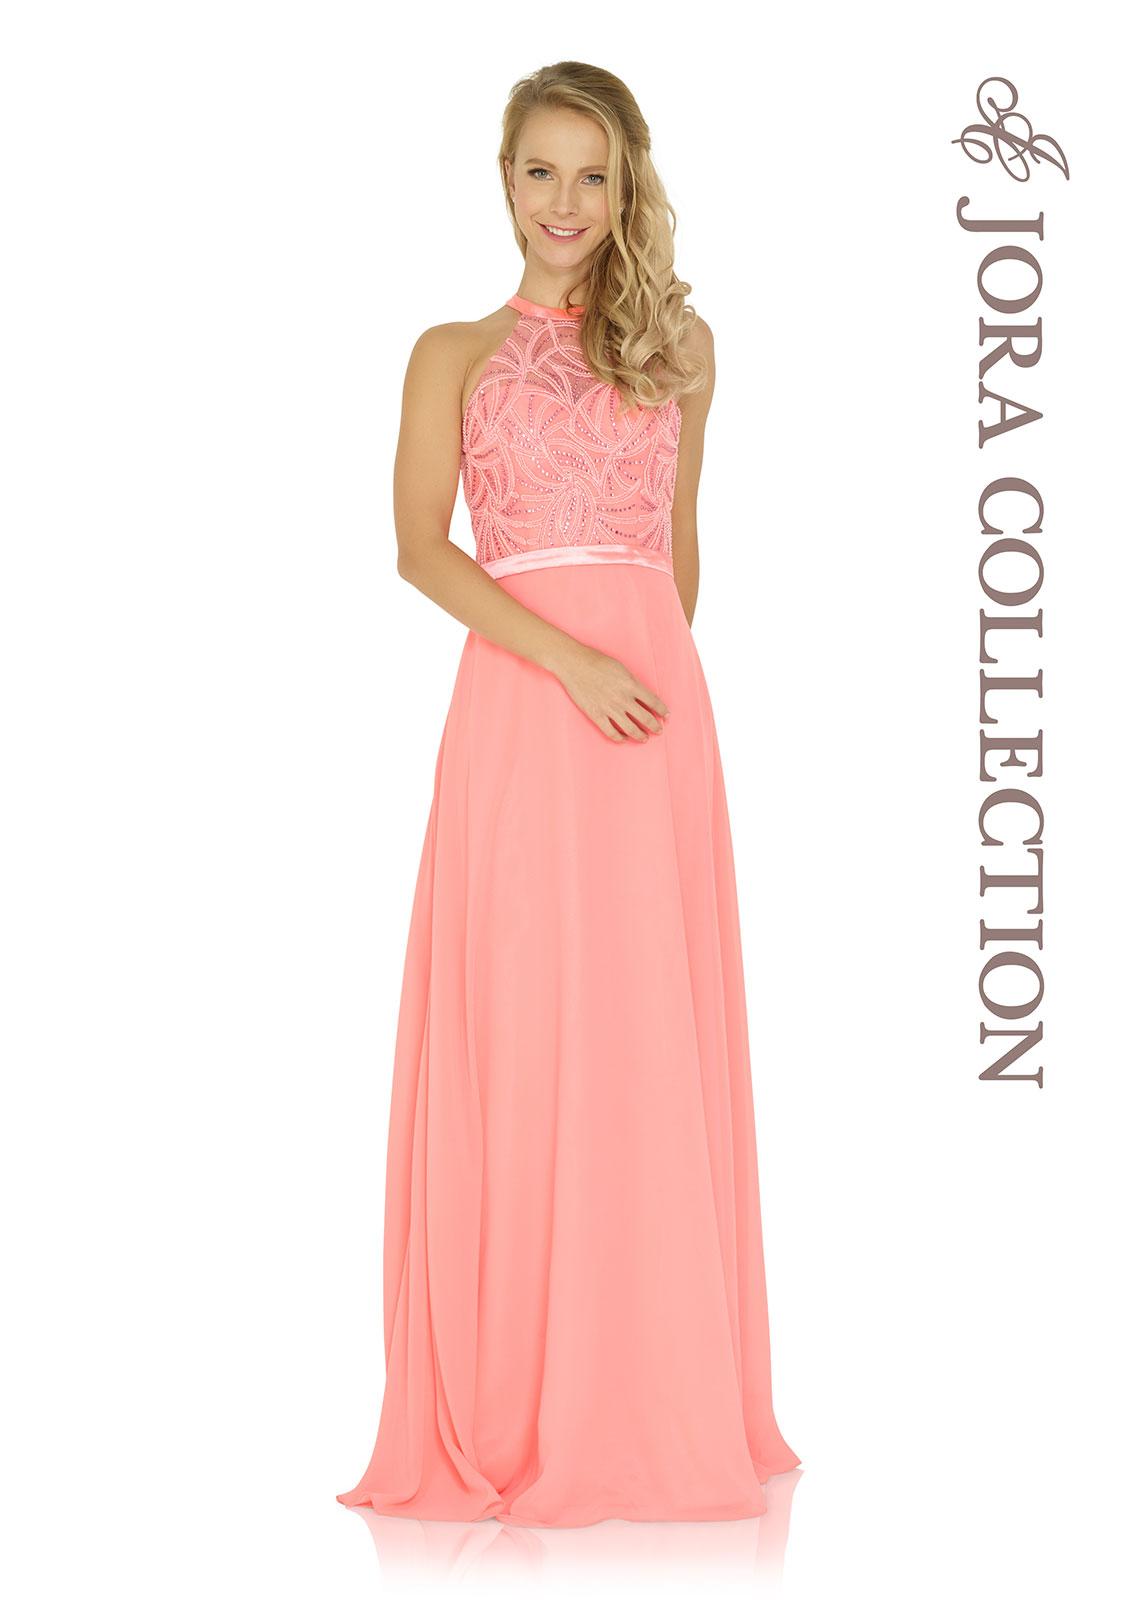 Lujo Vestidos De Fiesta Yonkers Motivo - Ideas de Vestido para La ...